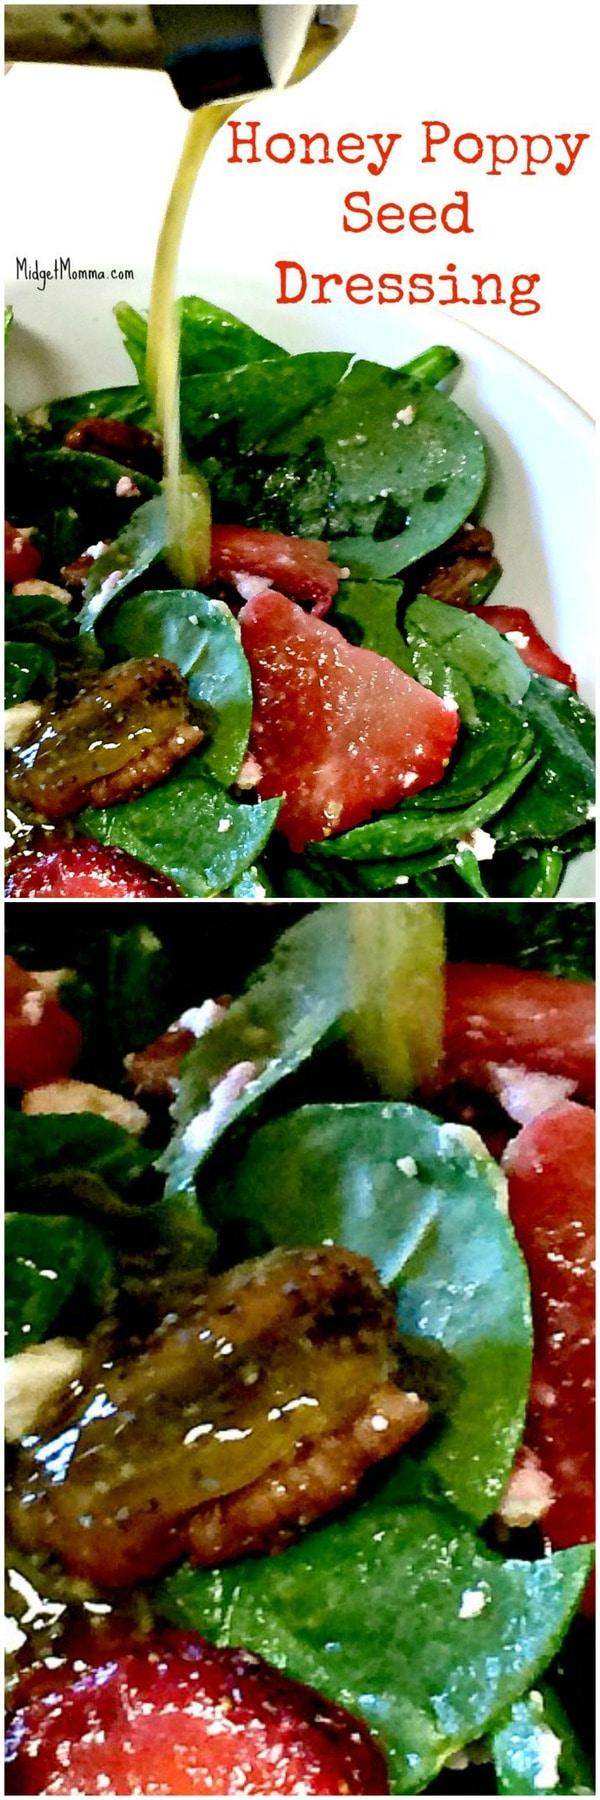 homemade honey poppy seed salad dressing recipe